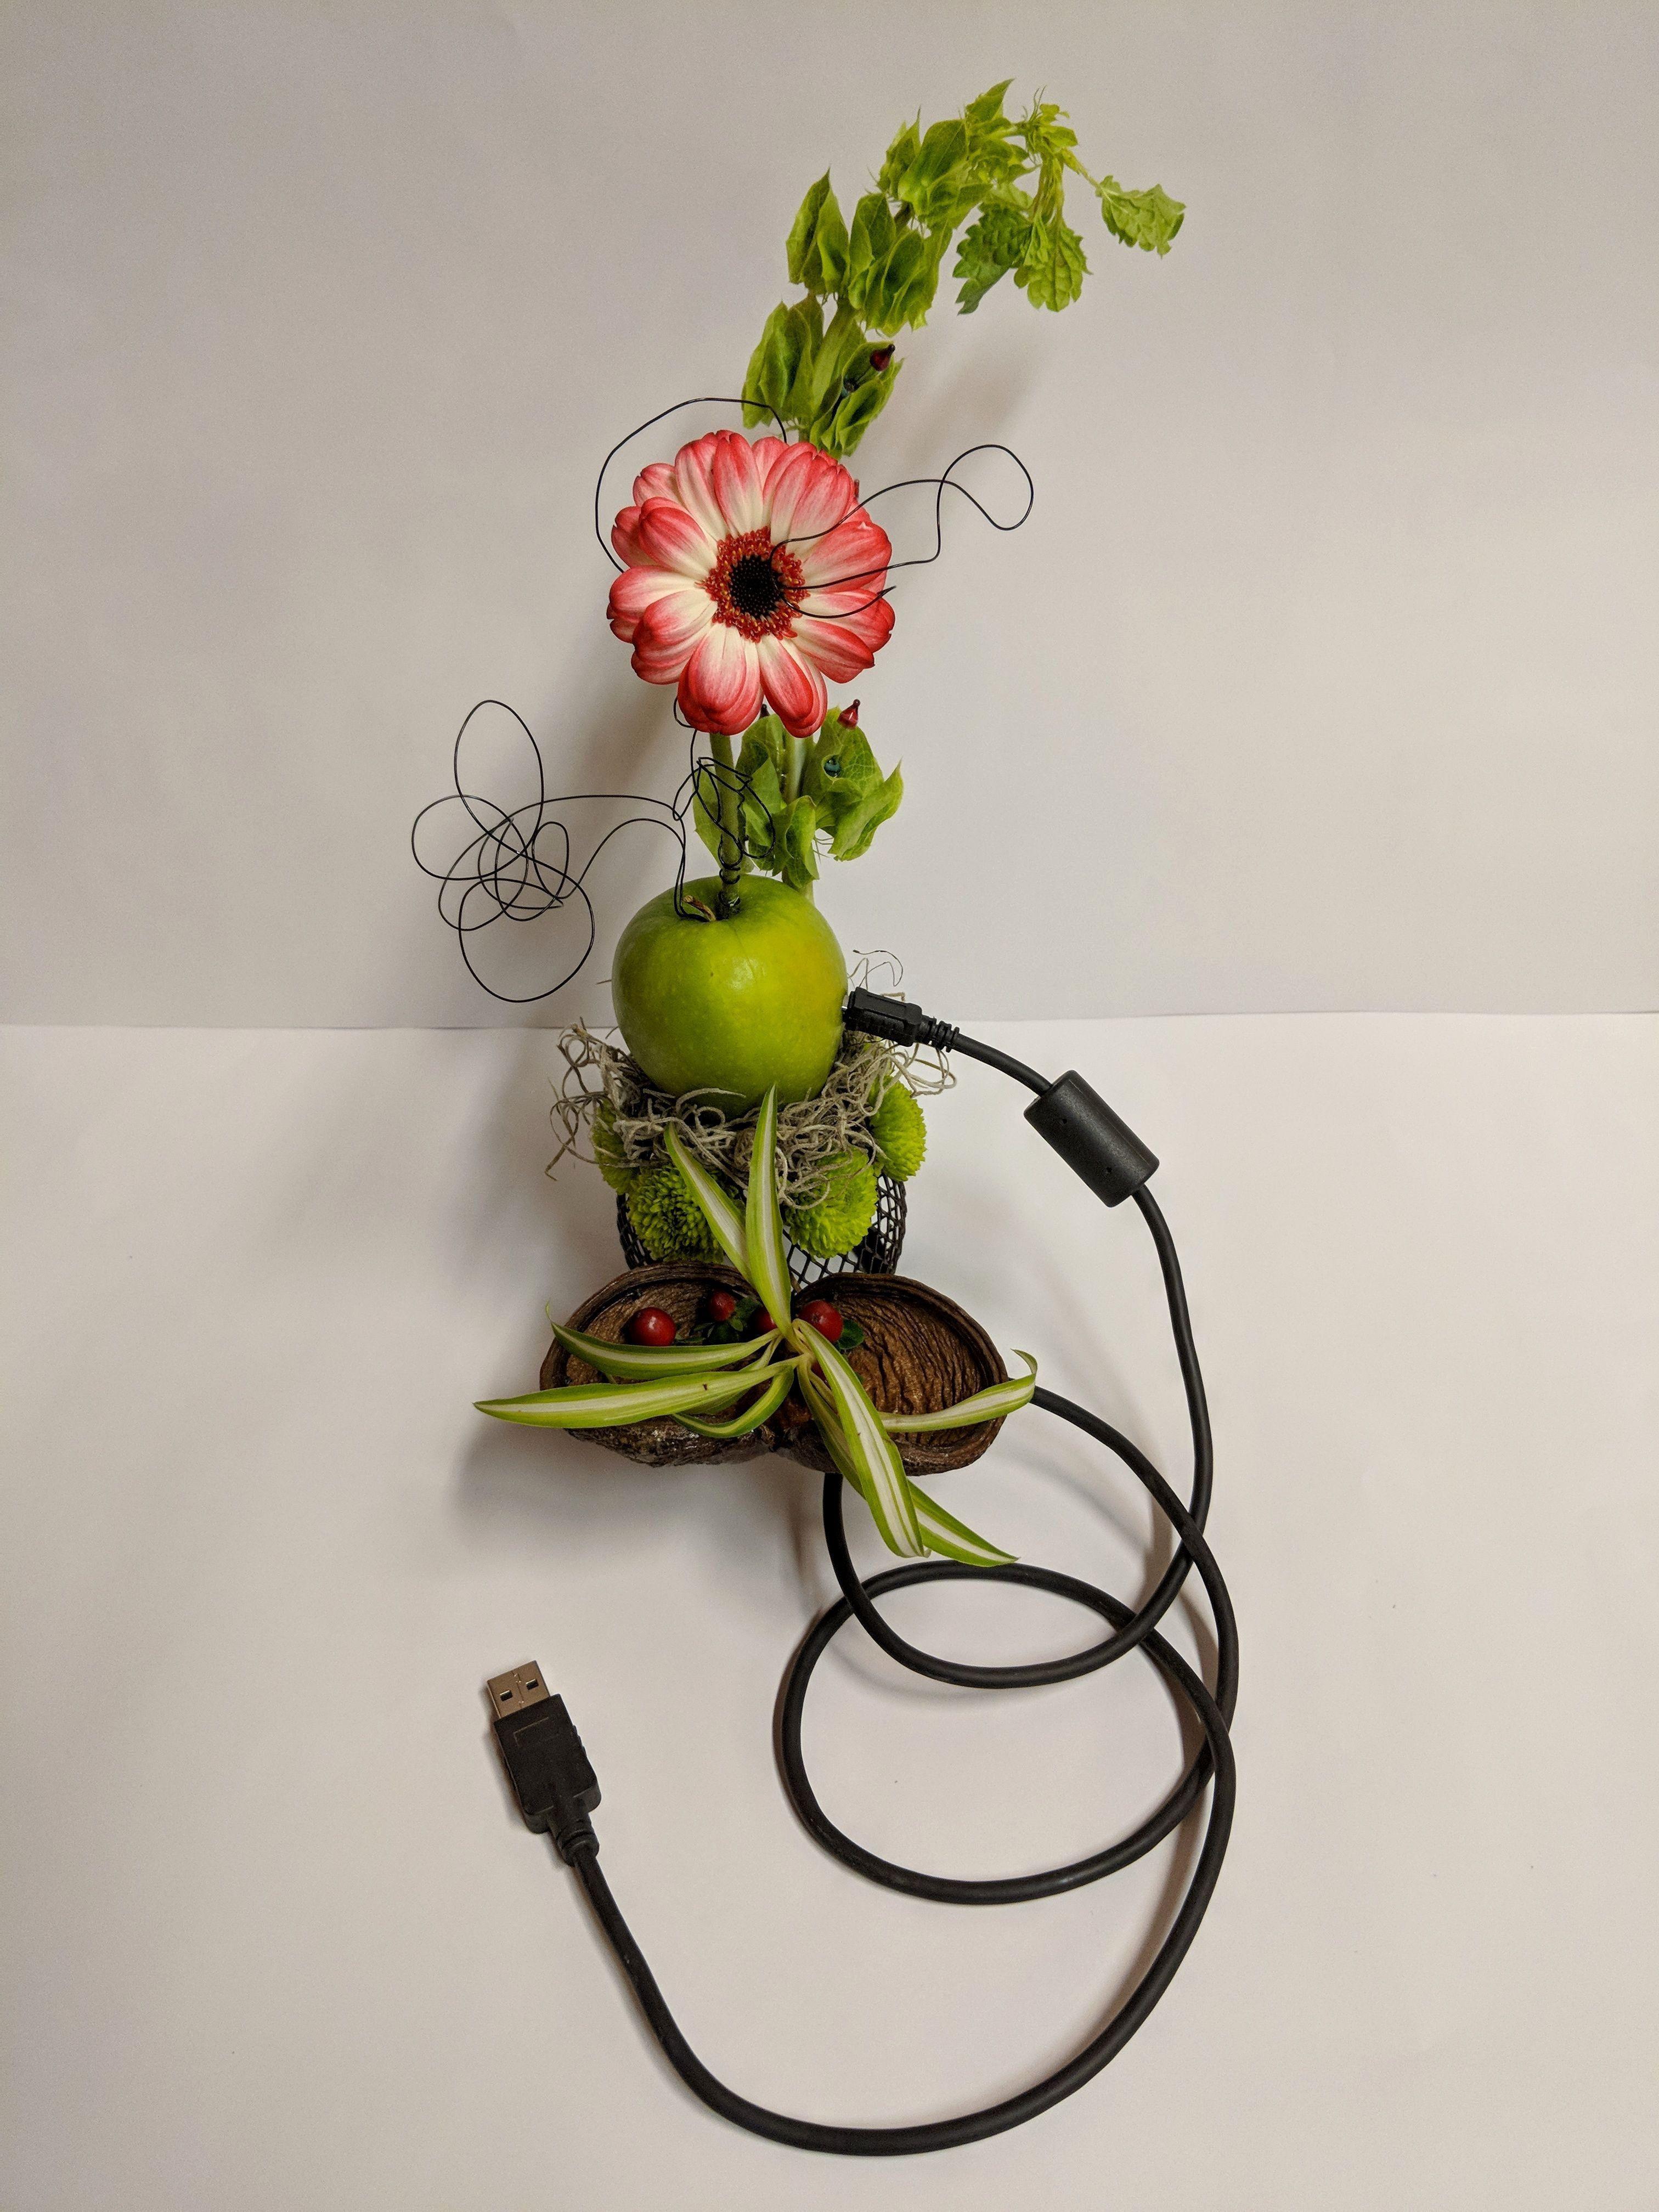 van gogh vase of sunflowers of vase with fifteen sunflowers elegant silk flower arrangements for in vase with fifteen sunflowers elegant silk flower arrangements for weddings best floral decor for home